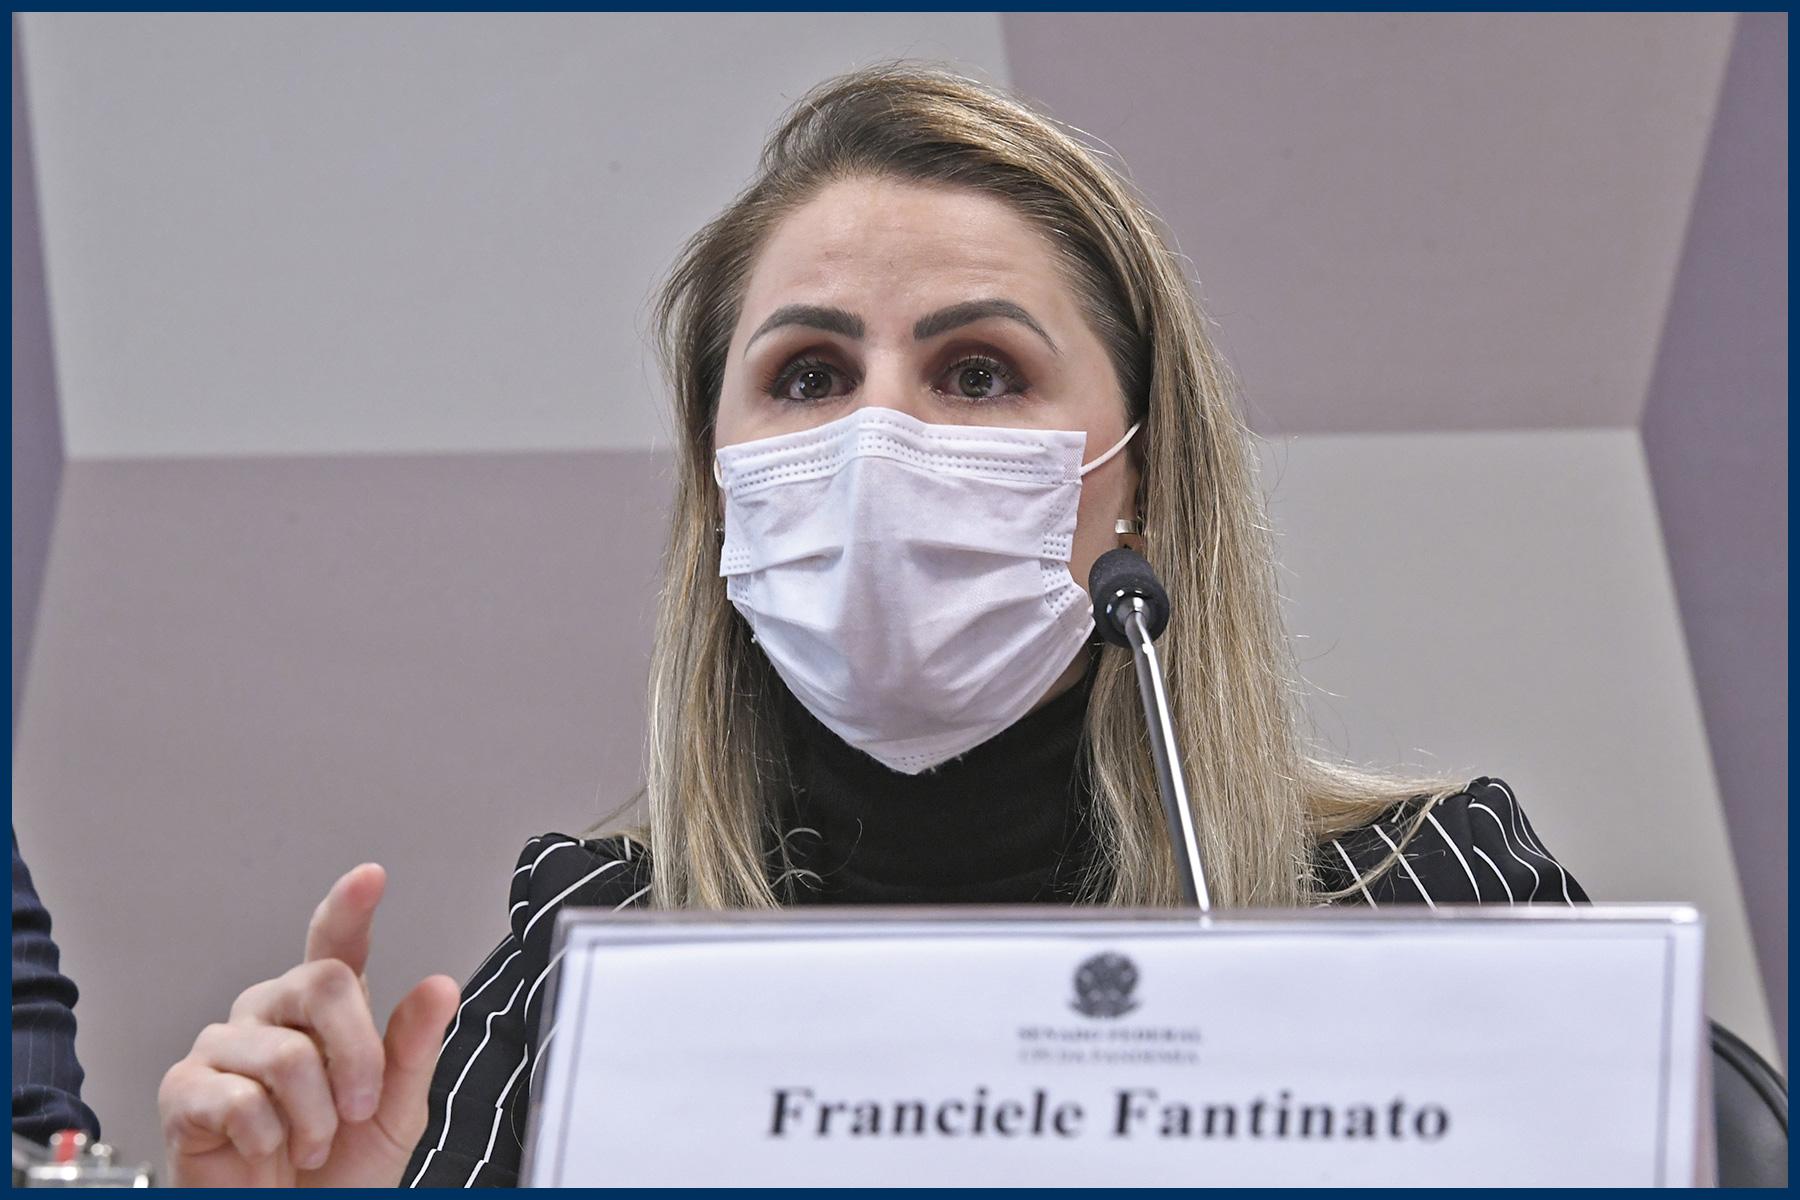 Francieli Fantinato